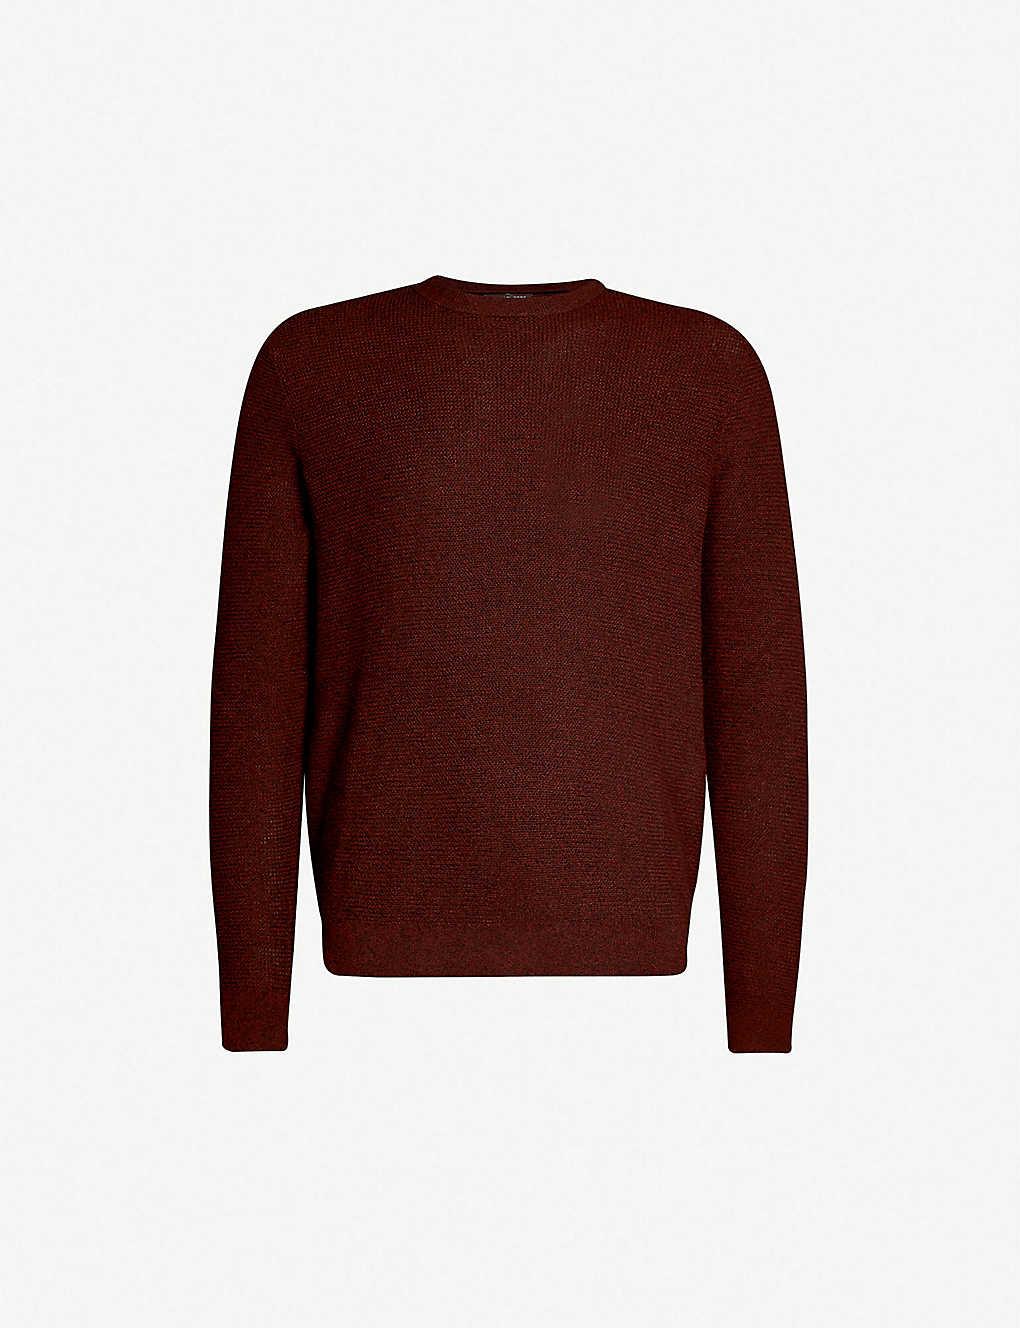 ebf1b5284b MICHAEL KORS - Crewneck cotton-blend jumper